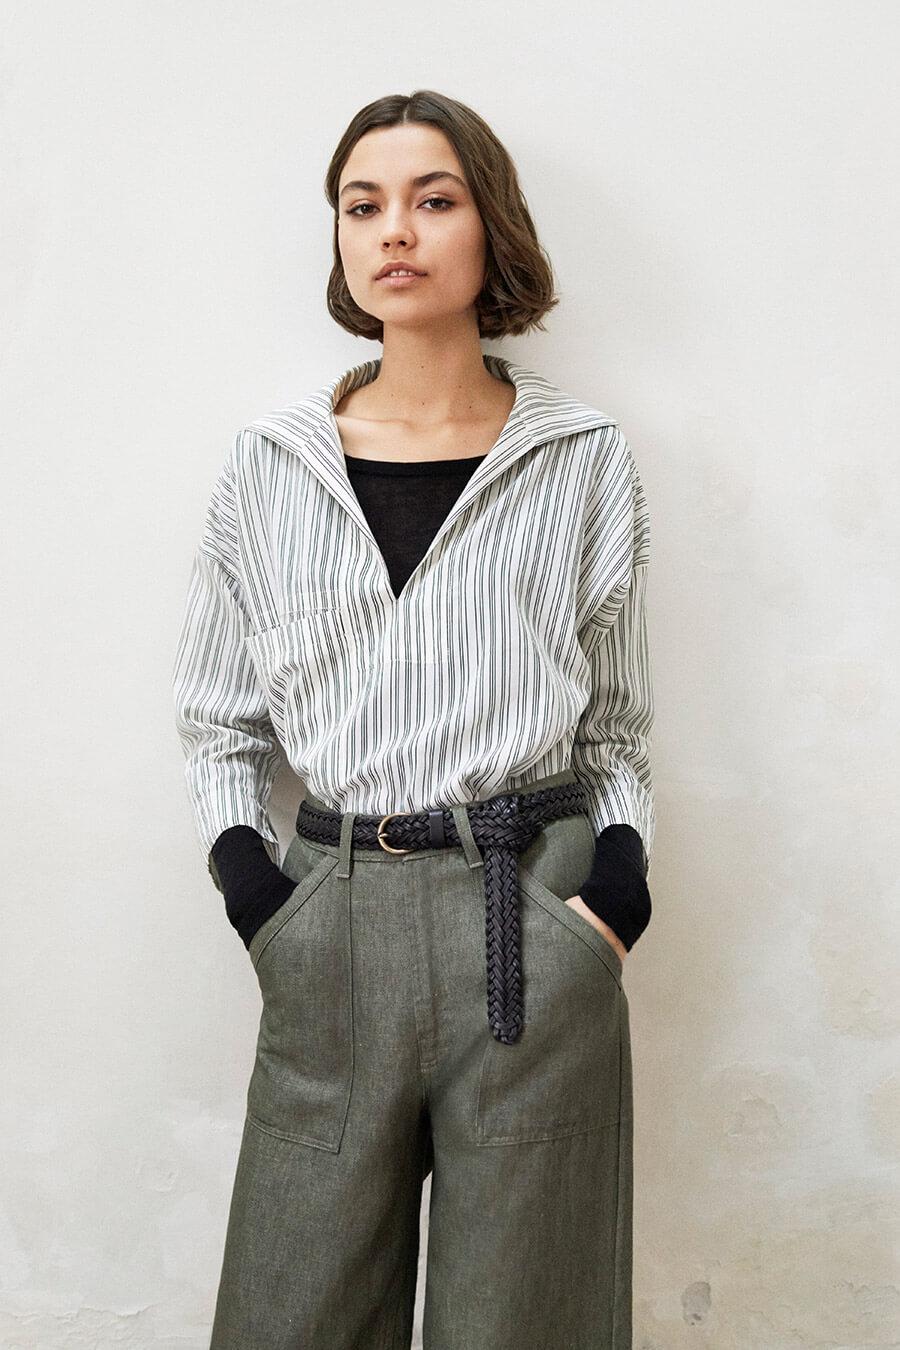 edc3b04c7f369 Lookbook Printemps 2019 - Mode femme | Comptoir des Cotonniers